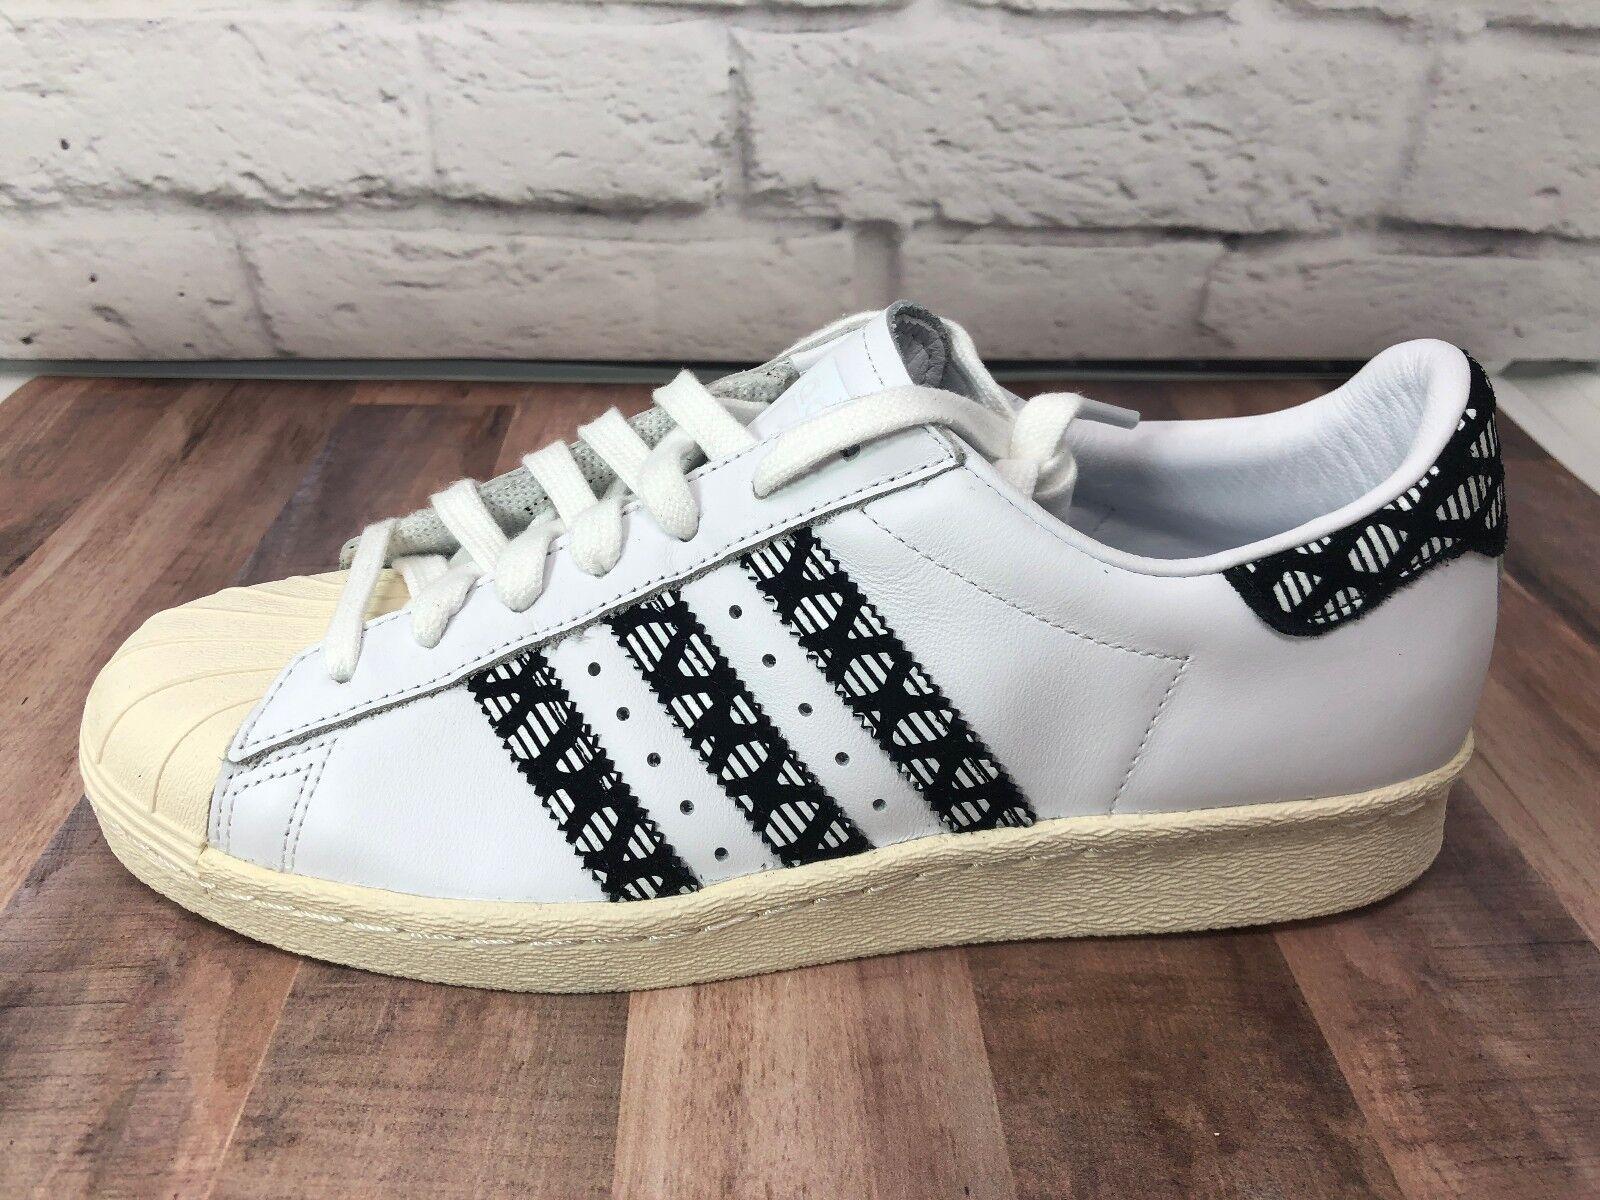 Adidas Superstar 80's Retro Samba Flux Black White Rare BY9074 Women's Sz 9